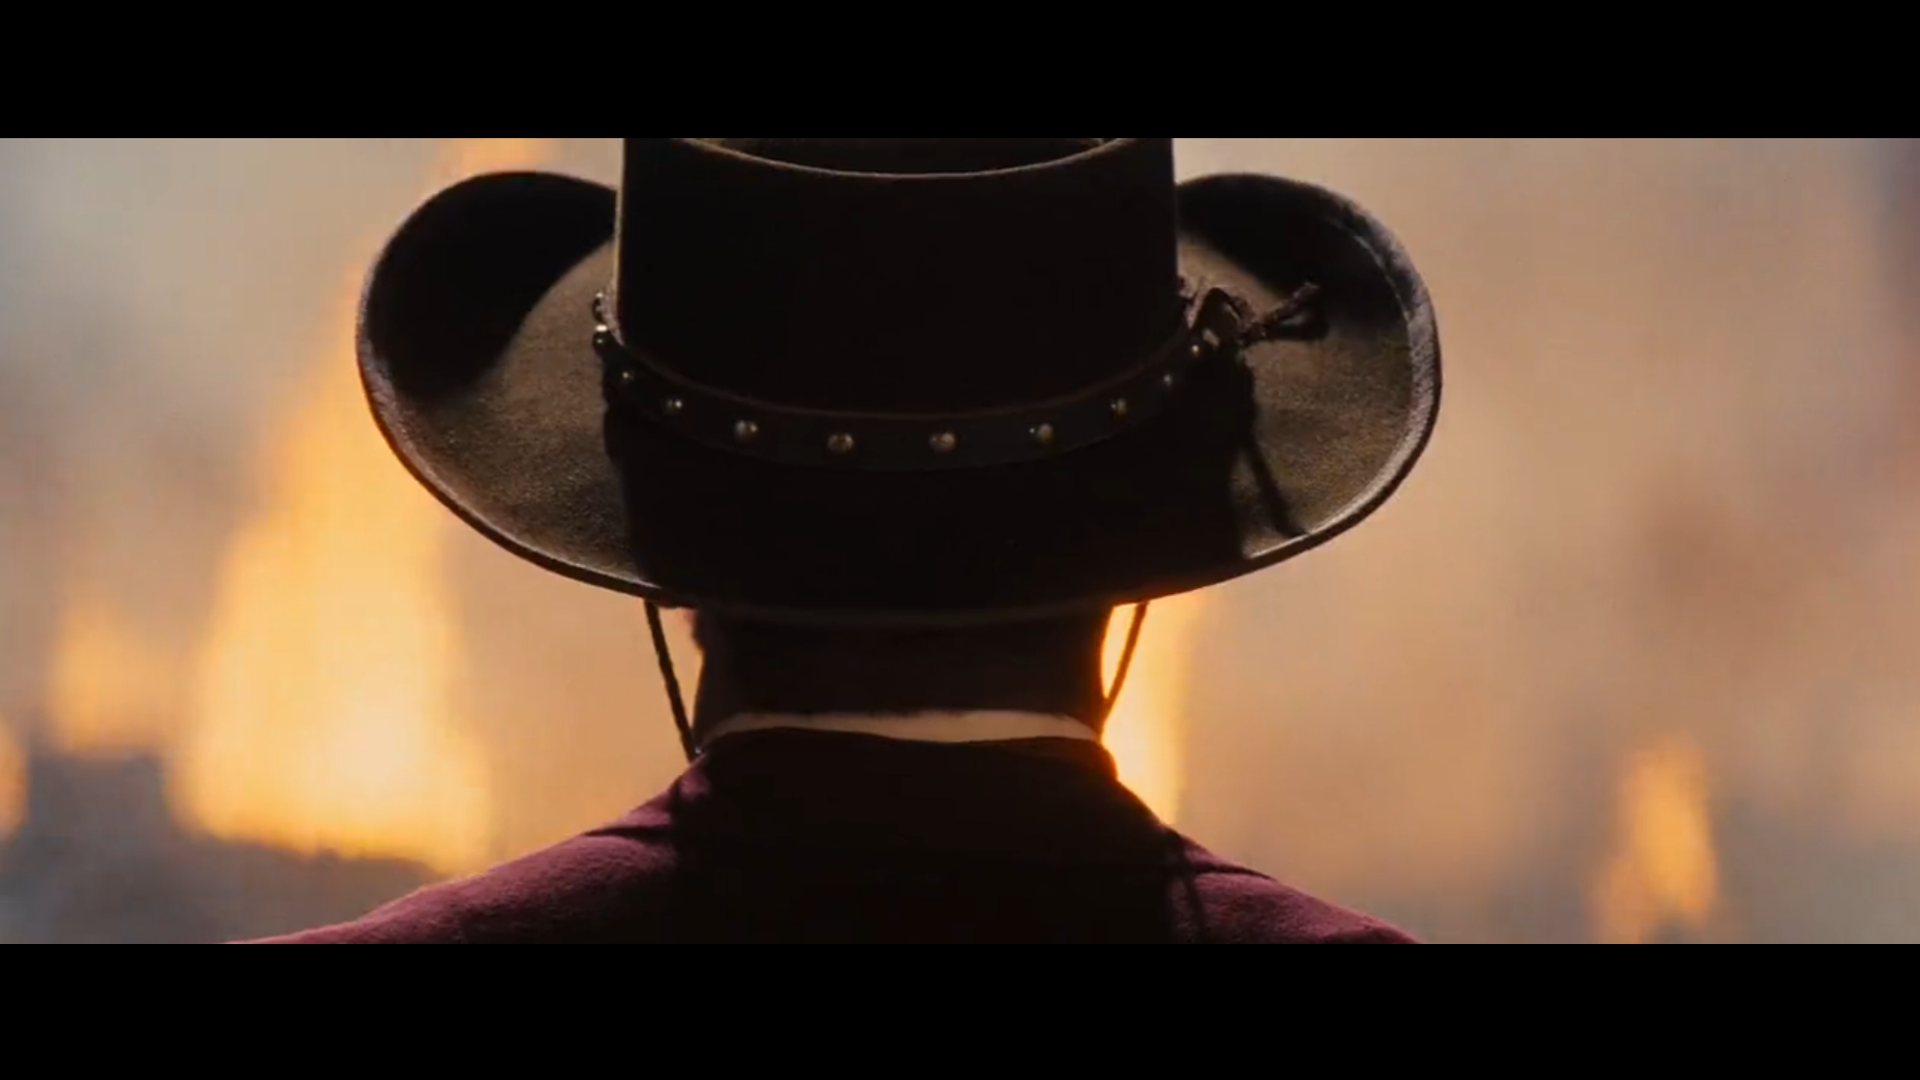 Background image django - Movie Django Unchained Wallpaper